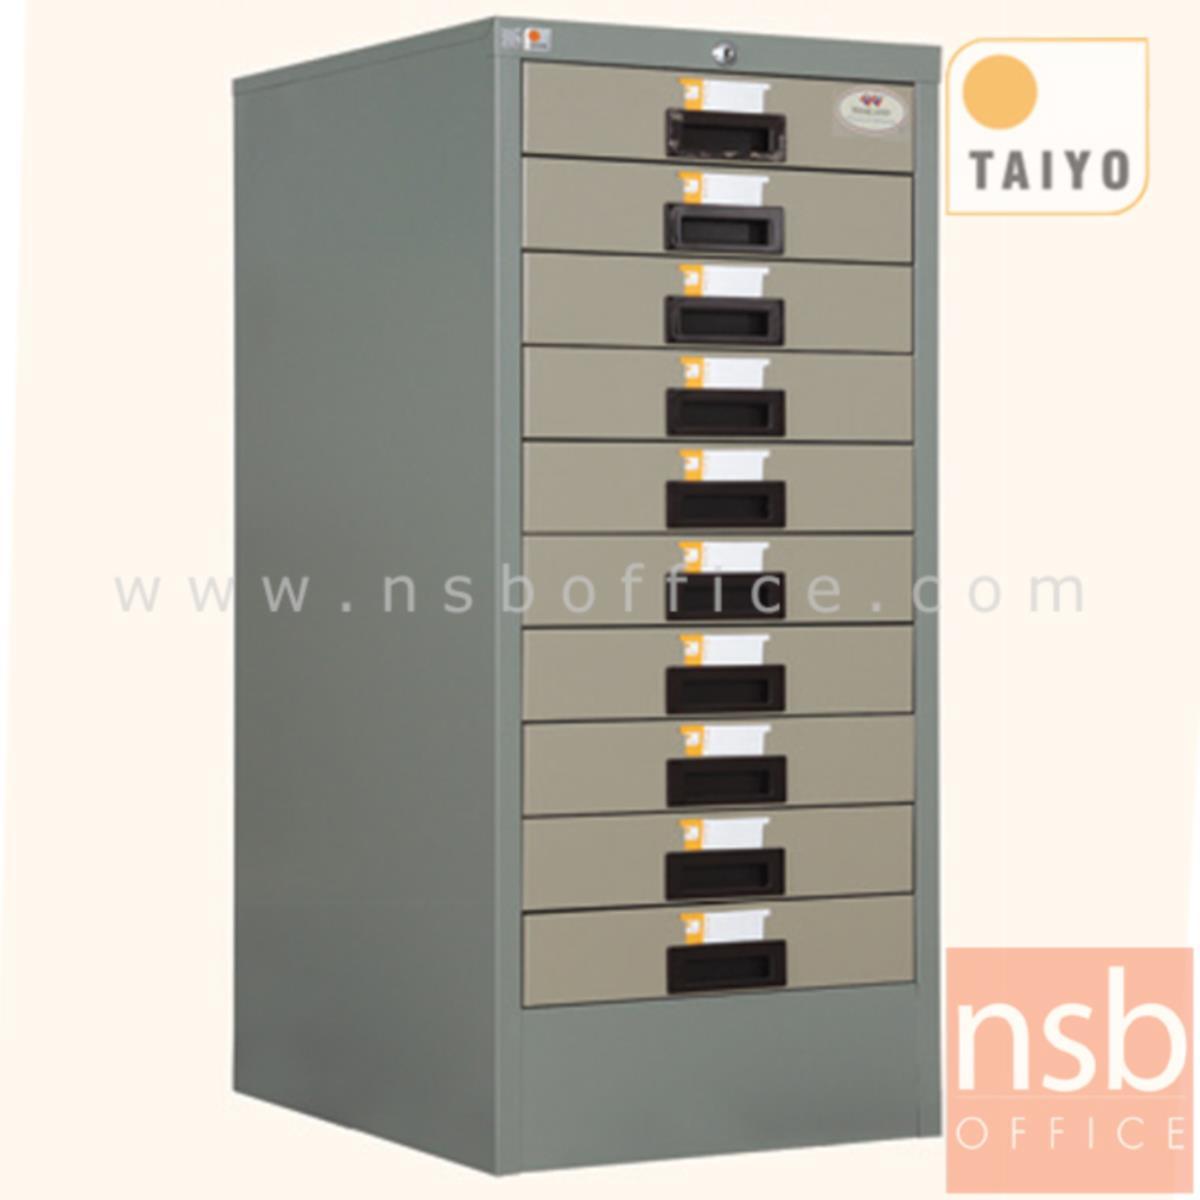 E02A030:ตู้เก็บแบบฟอร์ม 10 ลิ้นชัก ตั้งพื้น (กระดาษ A3)  รุ่น FR-910